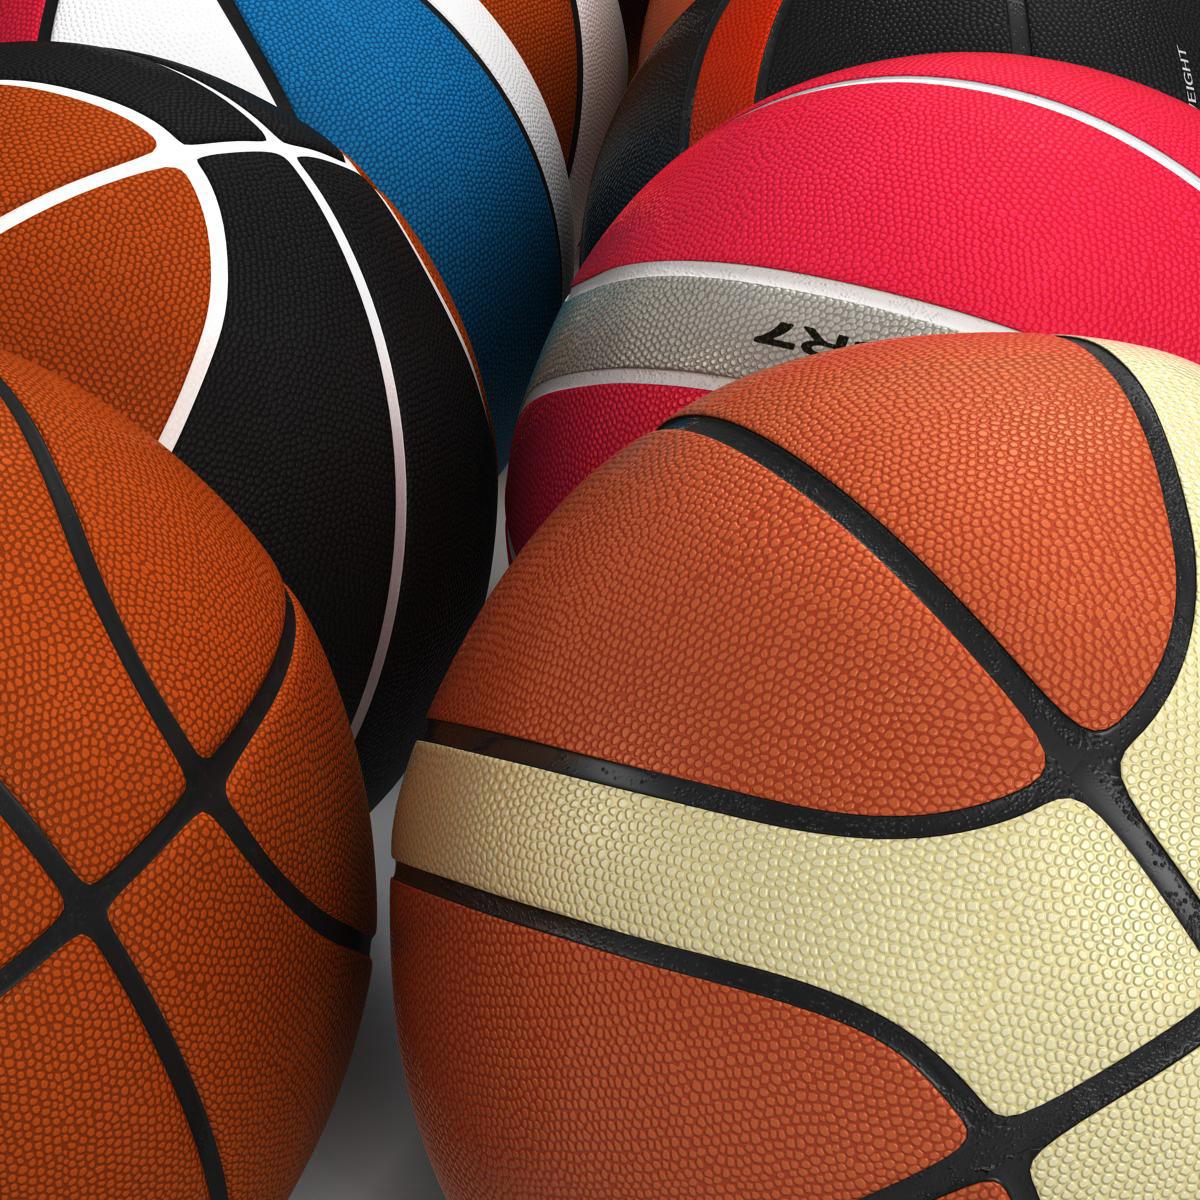 basketball ball set 3d model 3ds max fbx c4d ma mb obj 165934